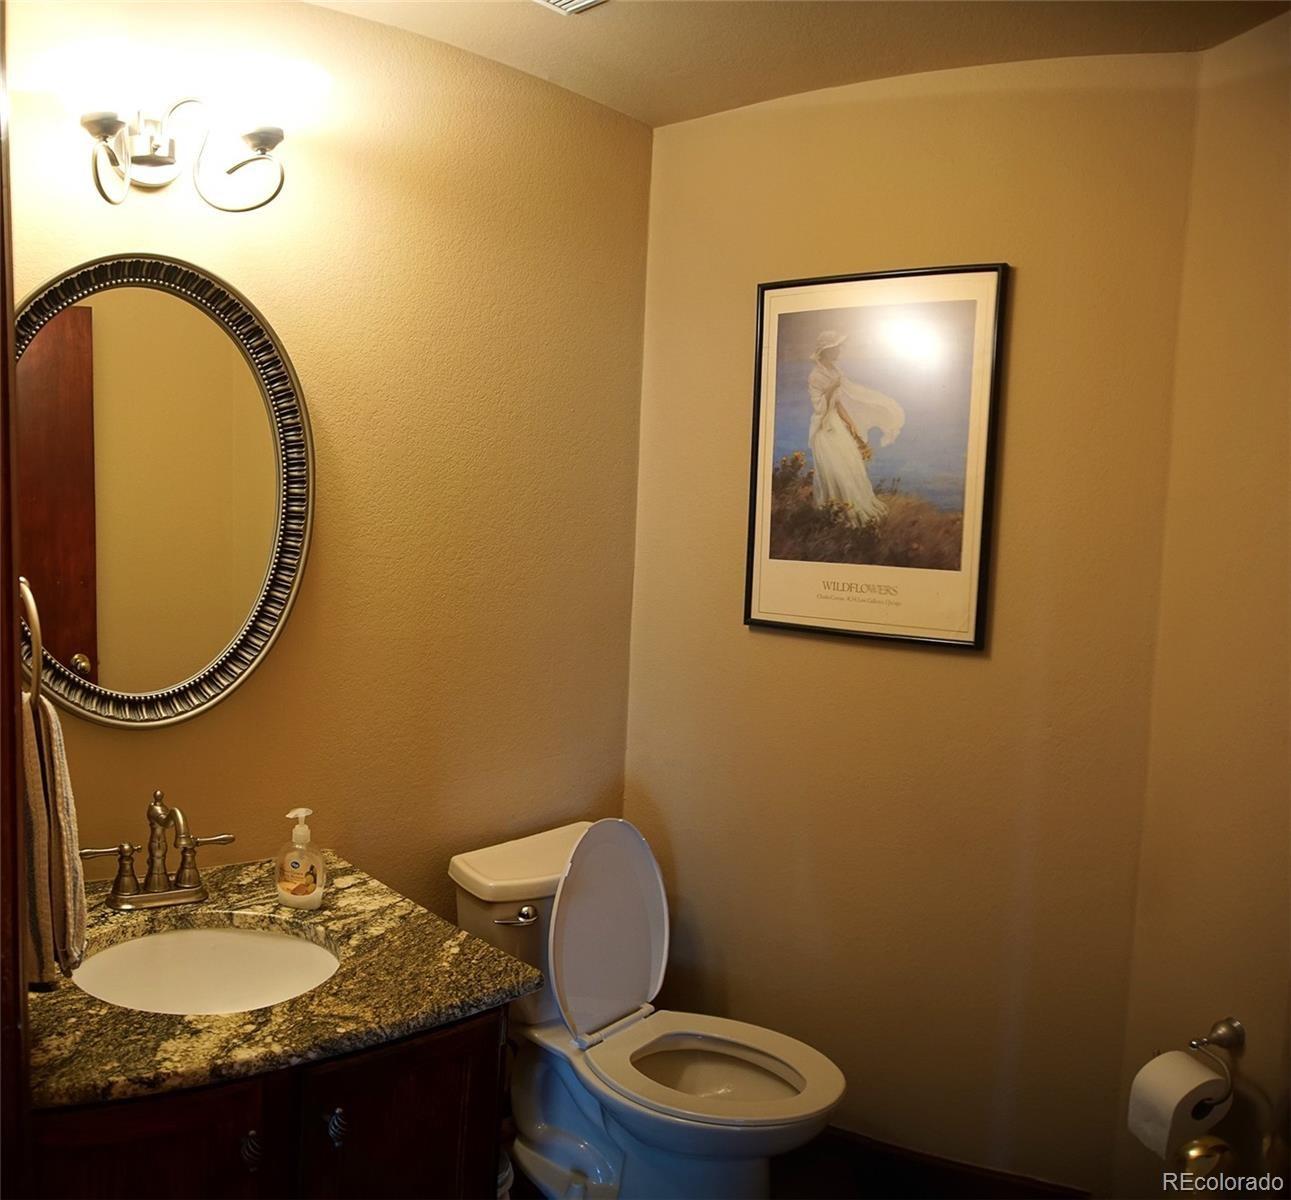 MLS# 3318398 - 9 - 4527 Buena Vista Court, Castle Rock, CO 80109